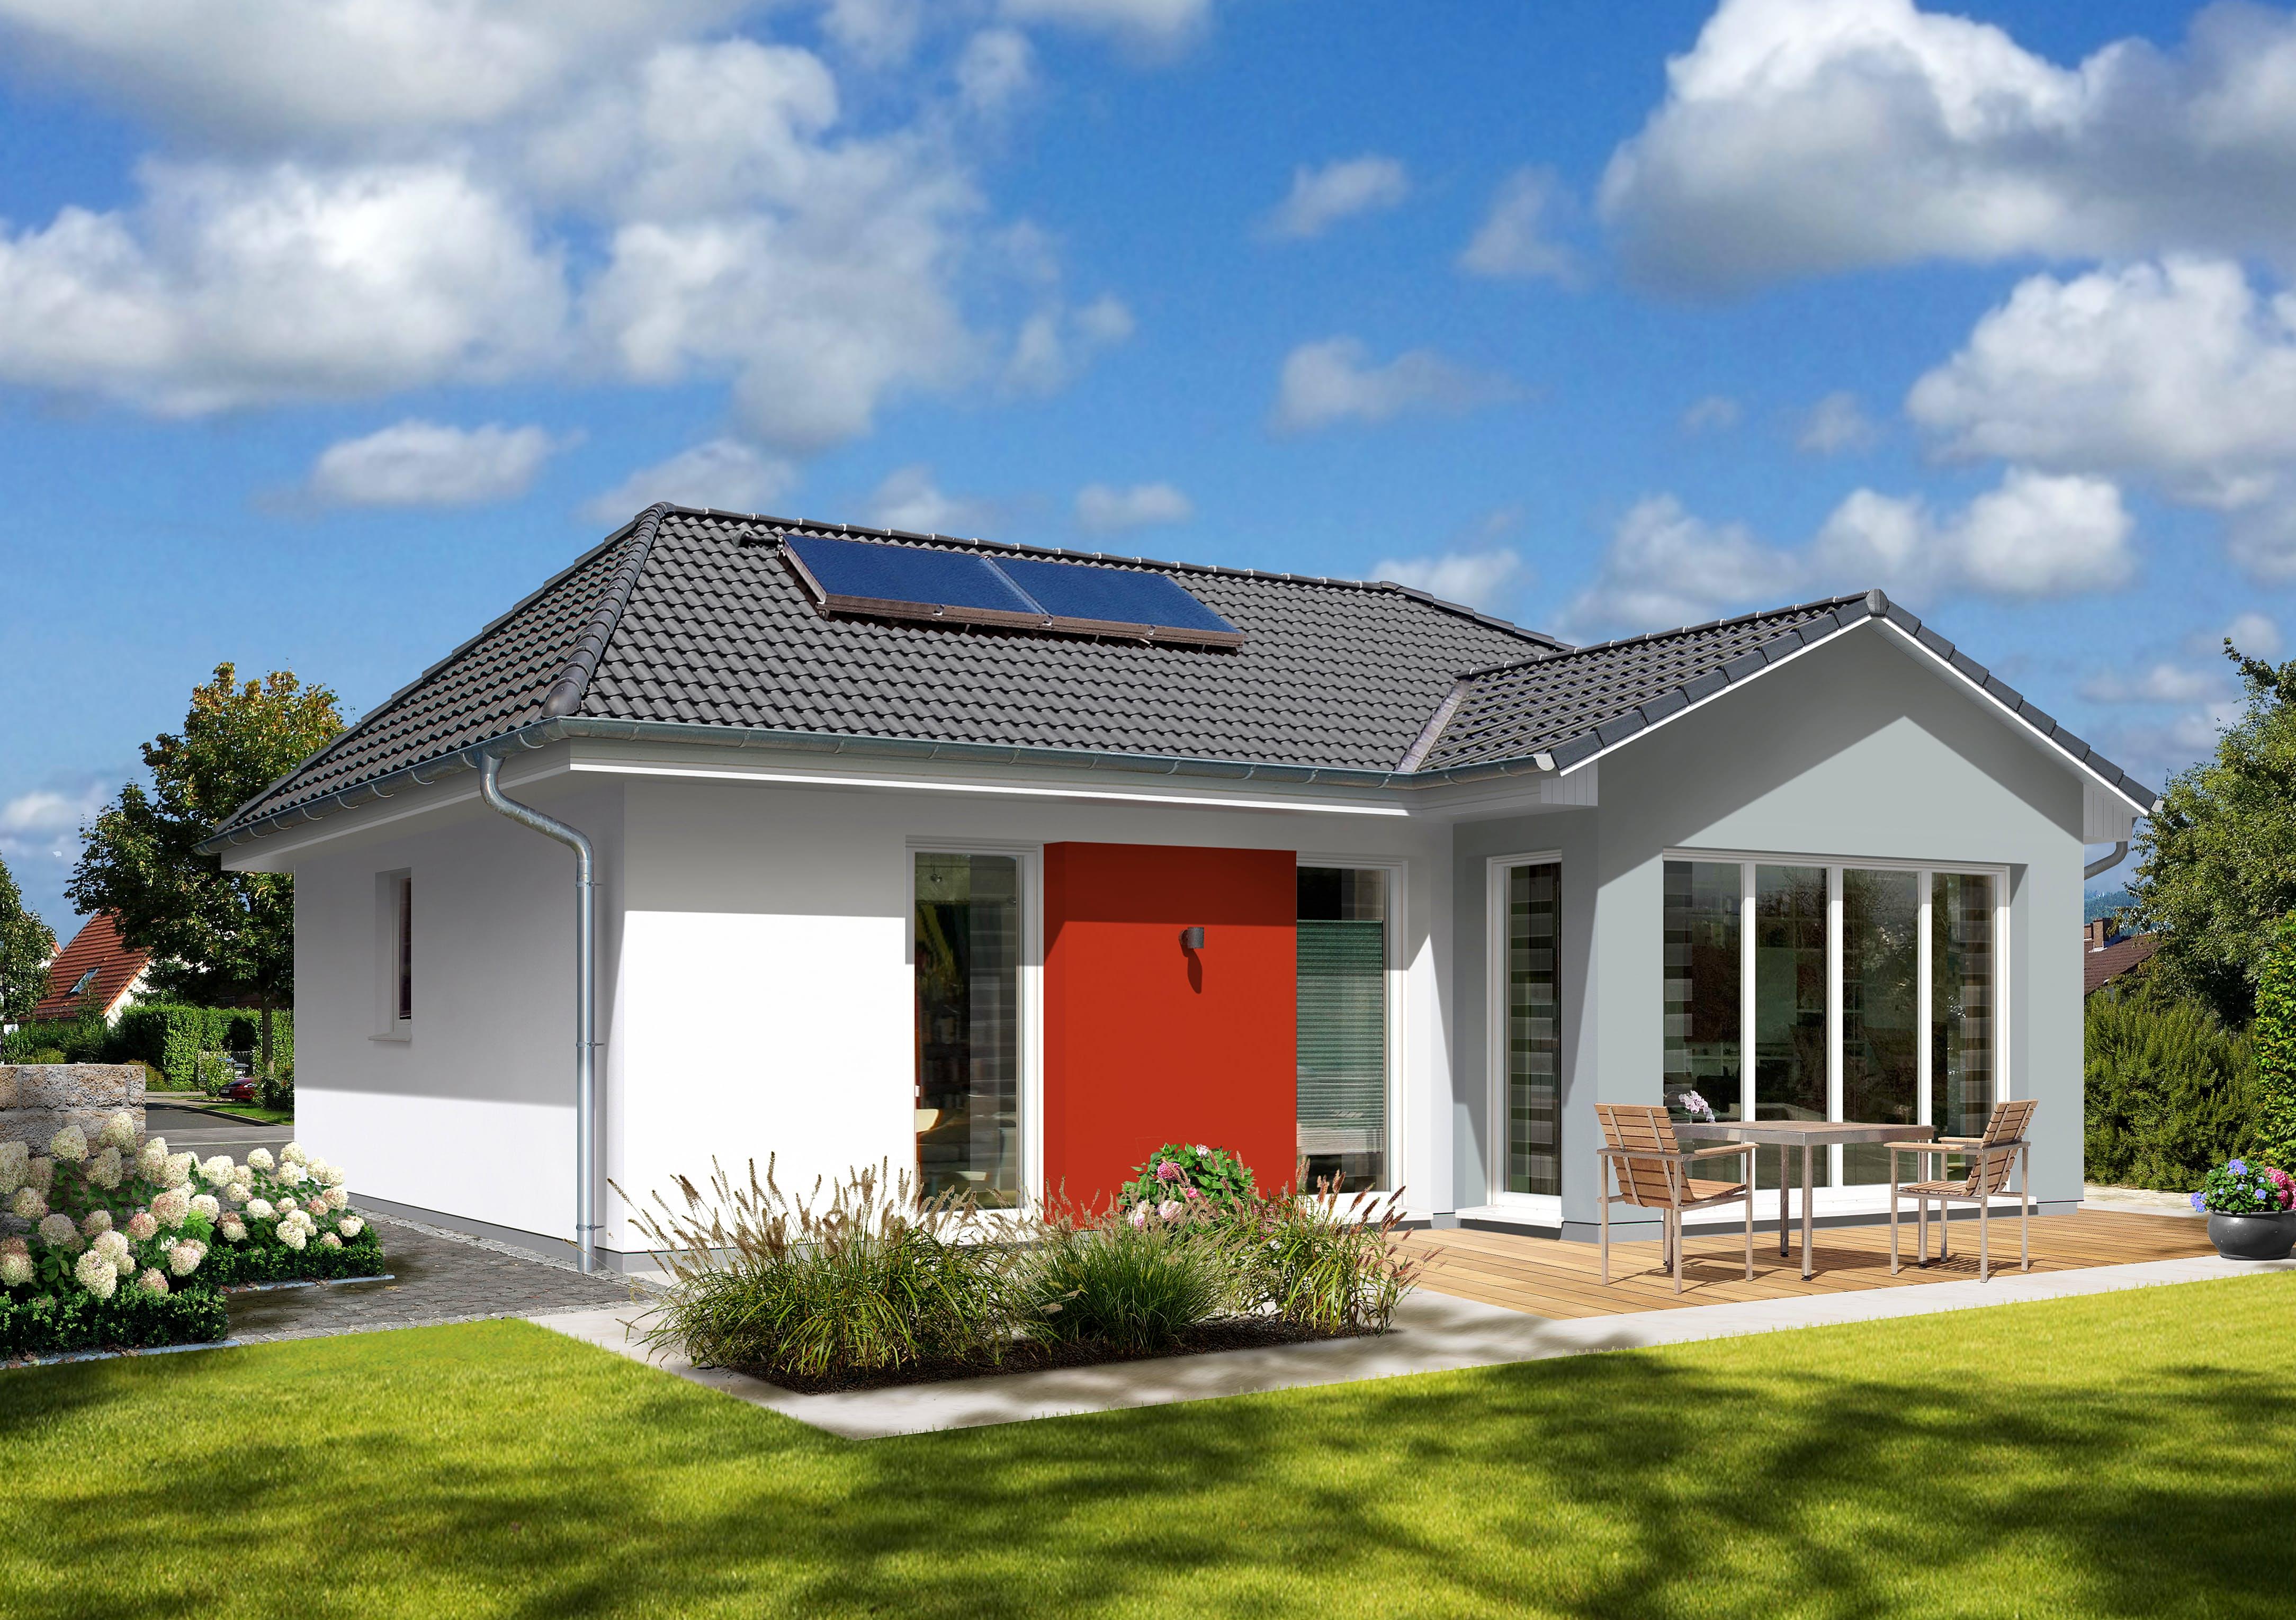 Haus Bauen Preise | jamgo.co